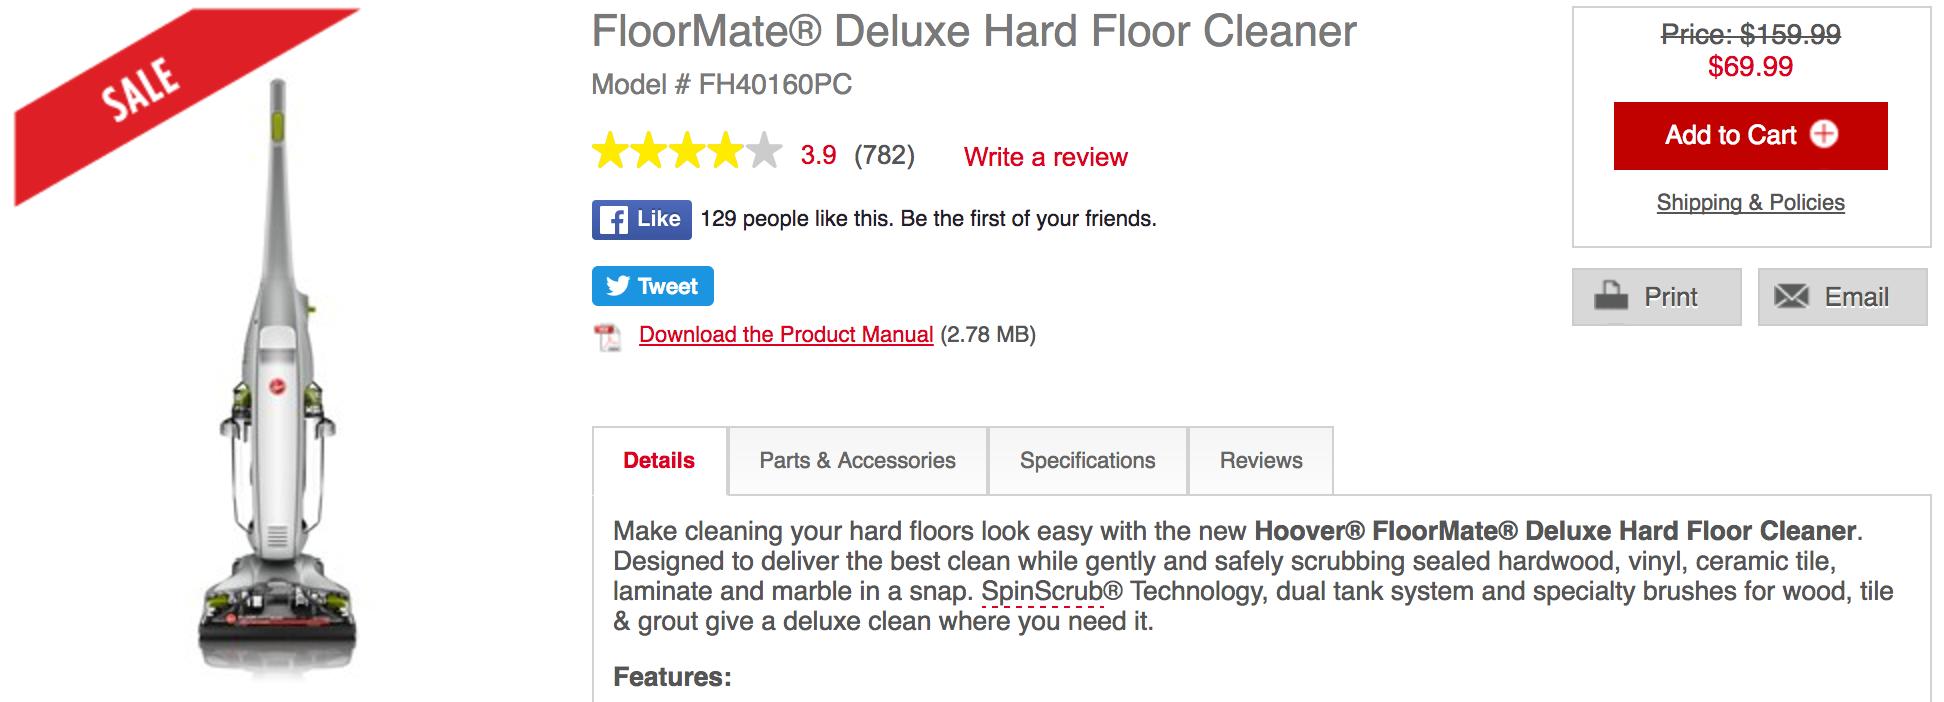 hoover-floormate-deluxe-hard-floor-cleaner-fh40160pc-2